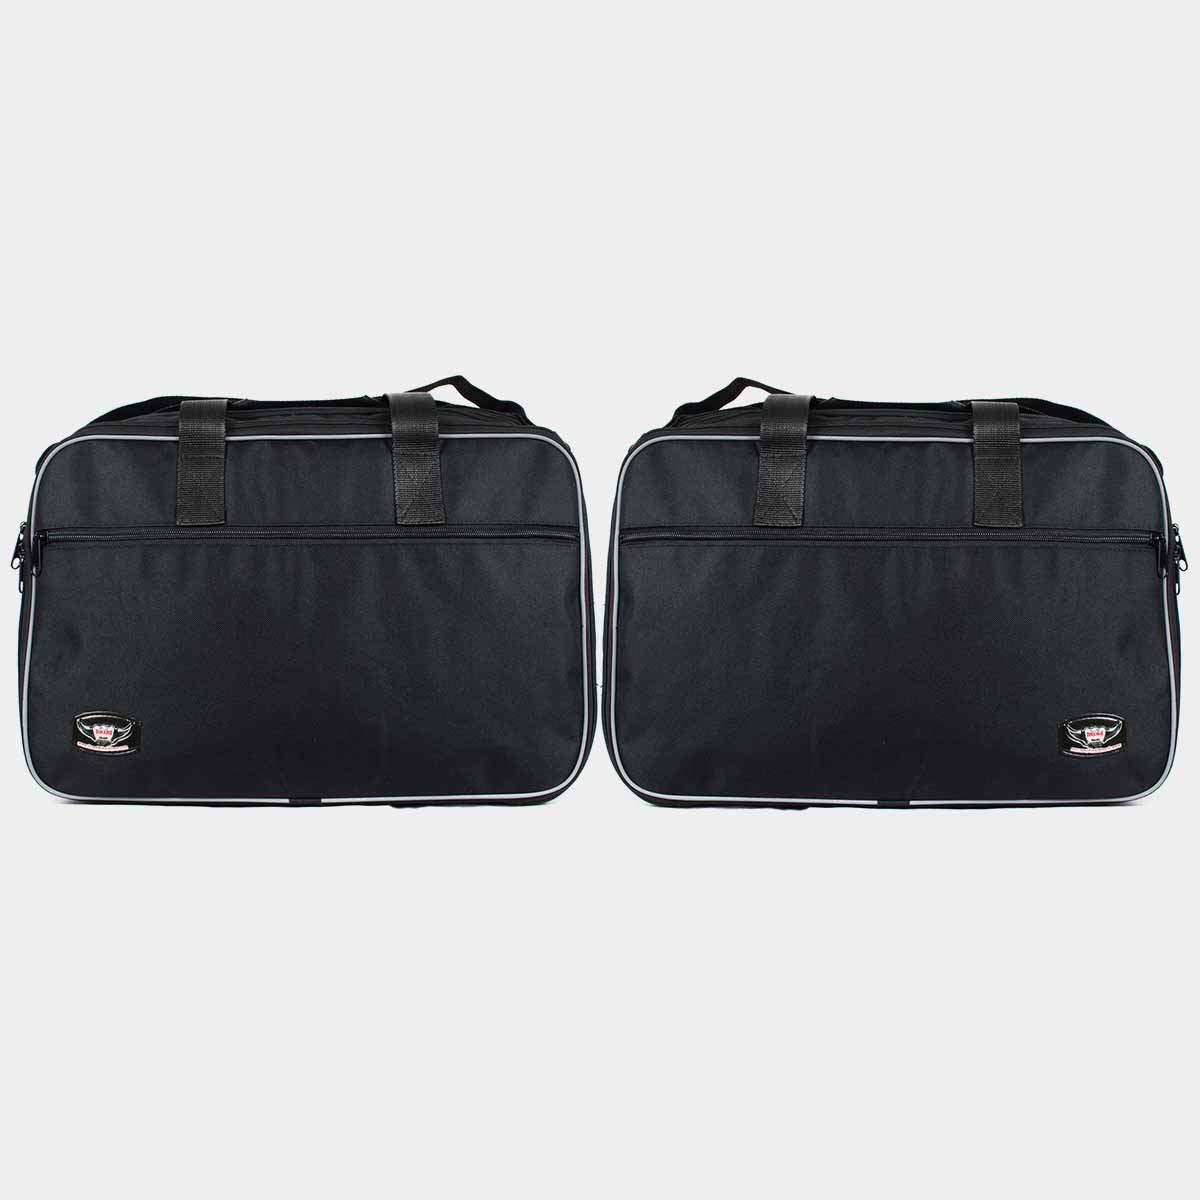 GREAT BIKERS GEAR Kawasaki Versys 1000//650Lt New Style Pannier Liner Bags Inner Bags Luggage Bags